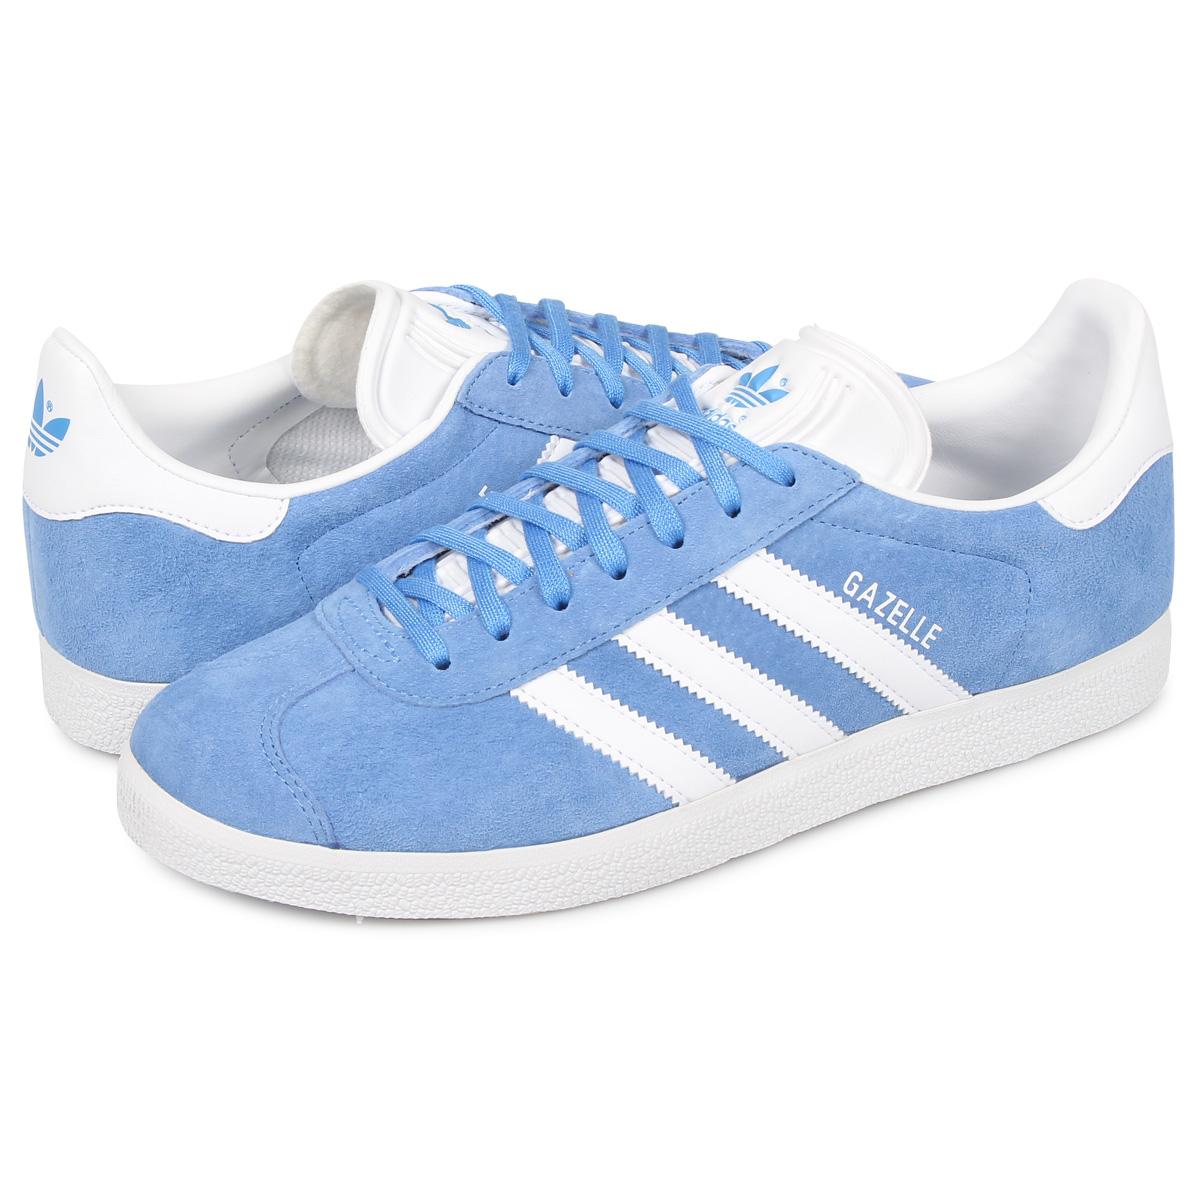 adidas Originals GAZELLE Adidas originals gazelle sneakers men gut Raabe roux EE5511